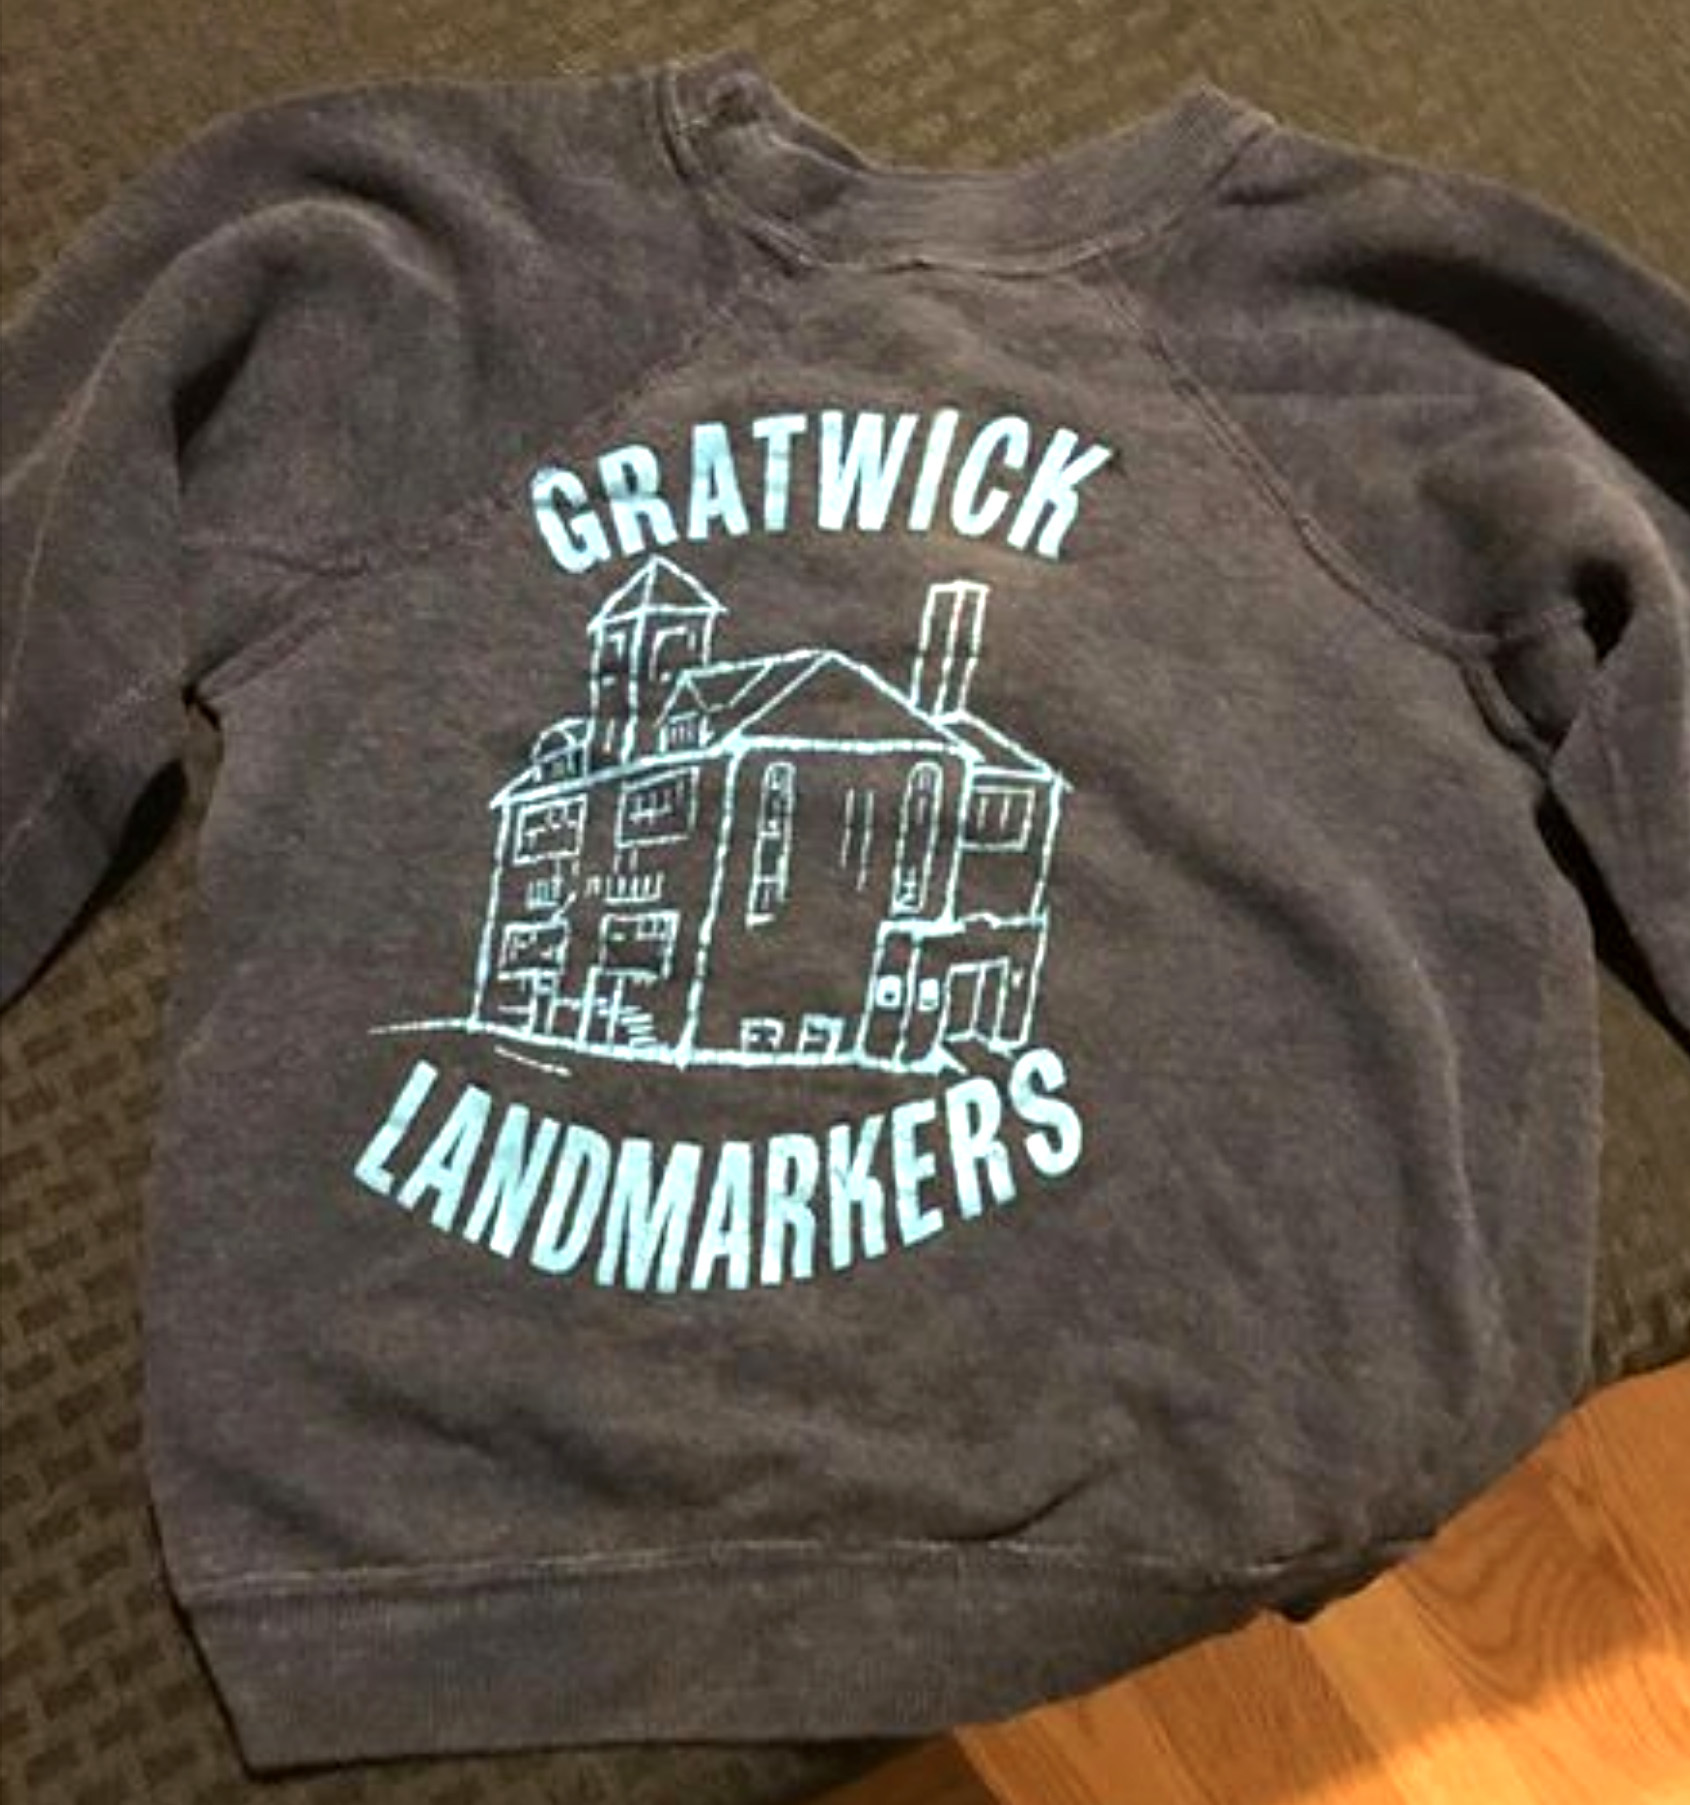 Gratwick Landmarkers, sweatshirt (1979).jpg